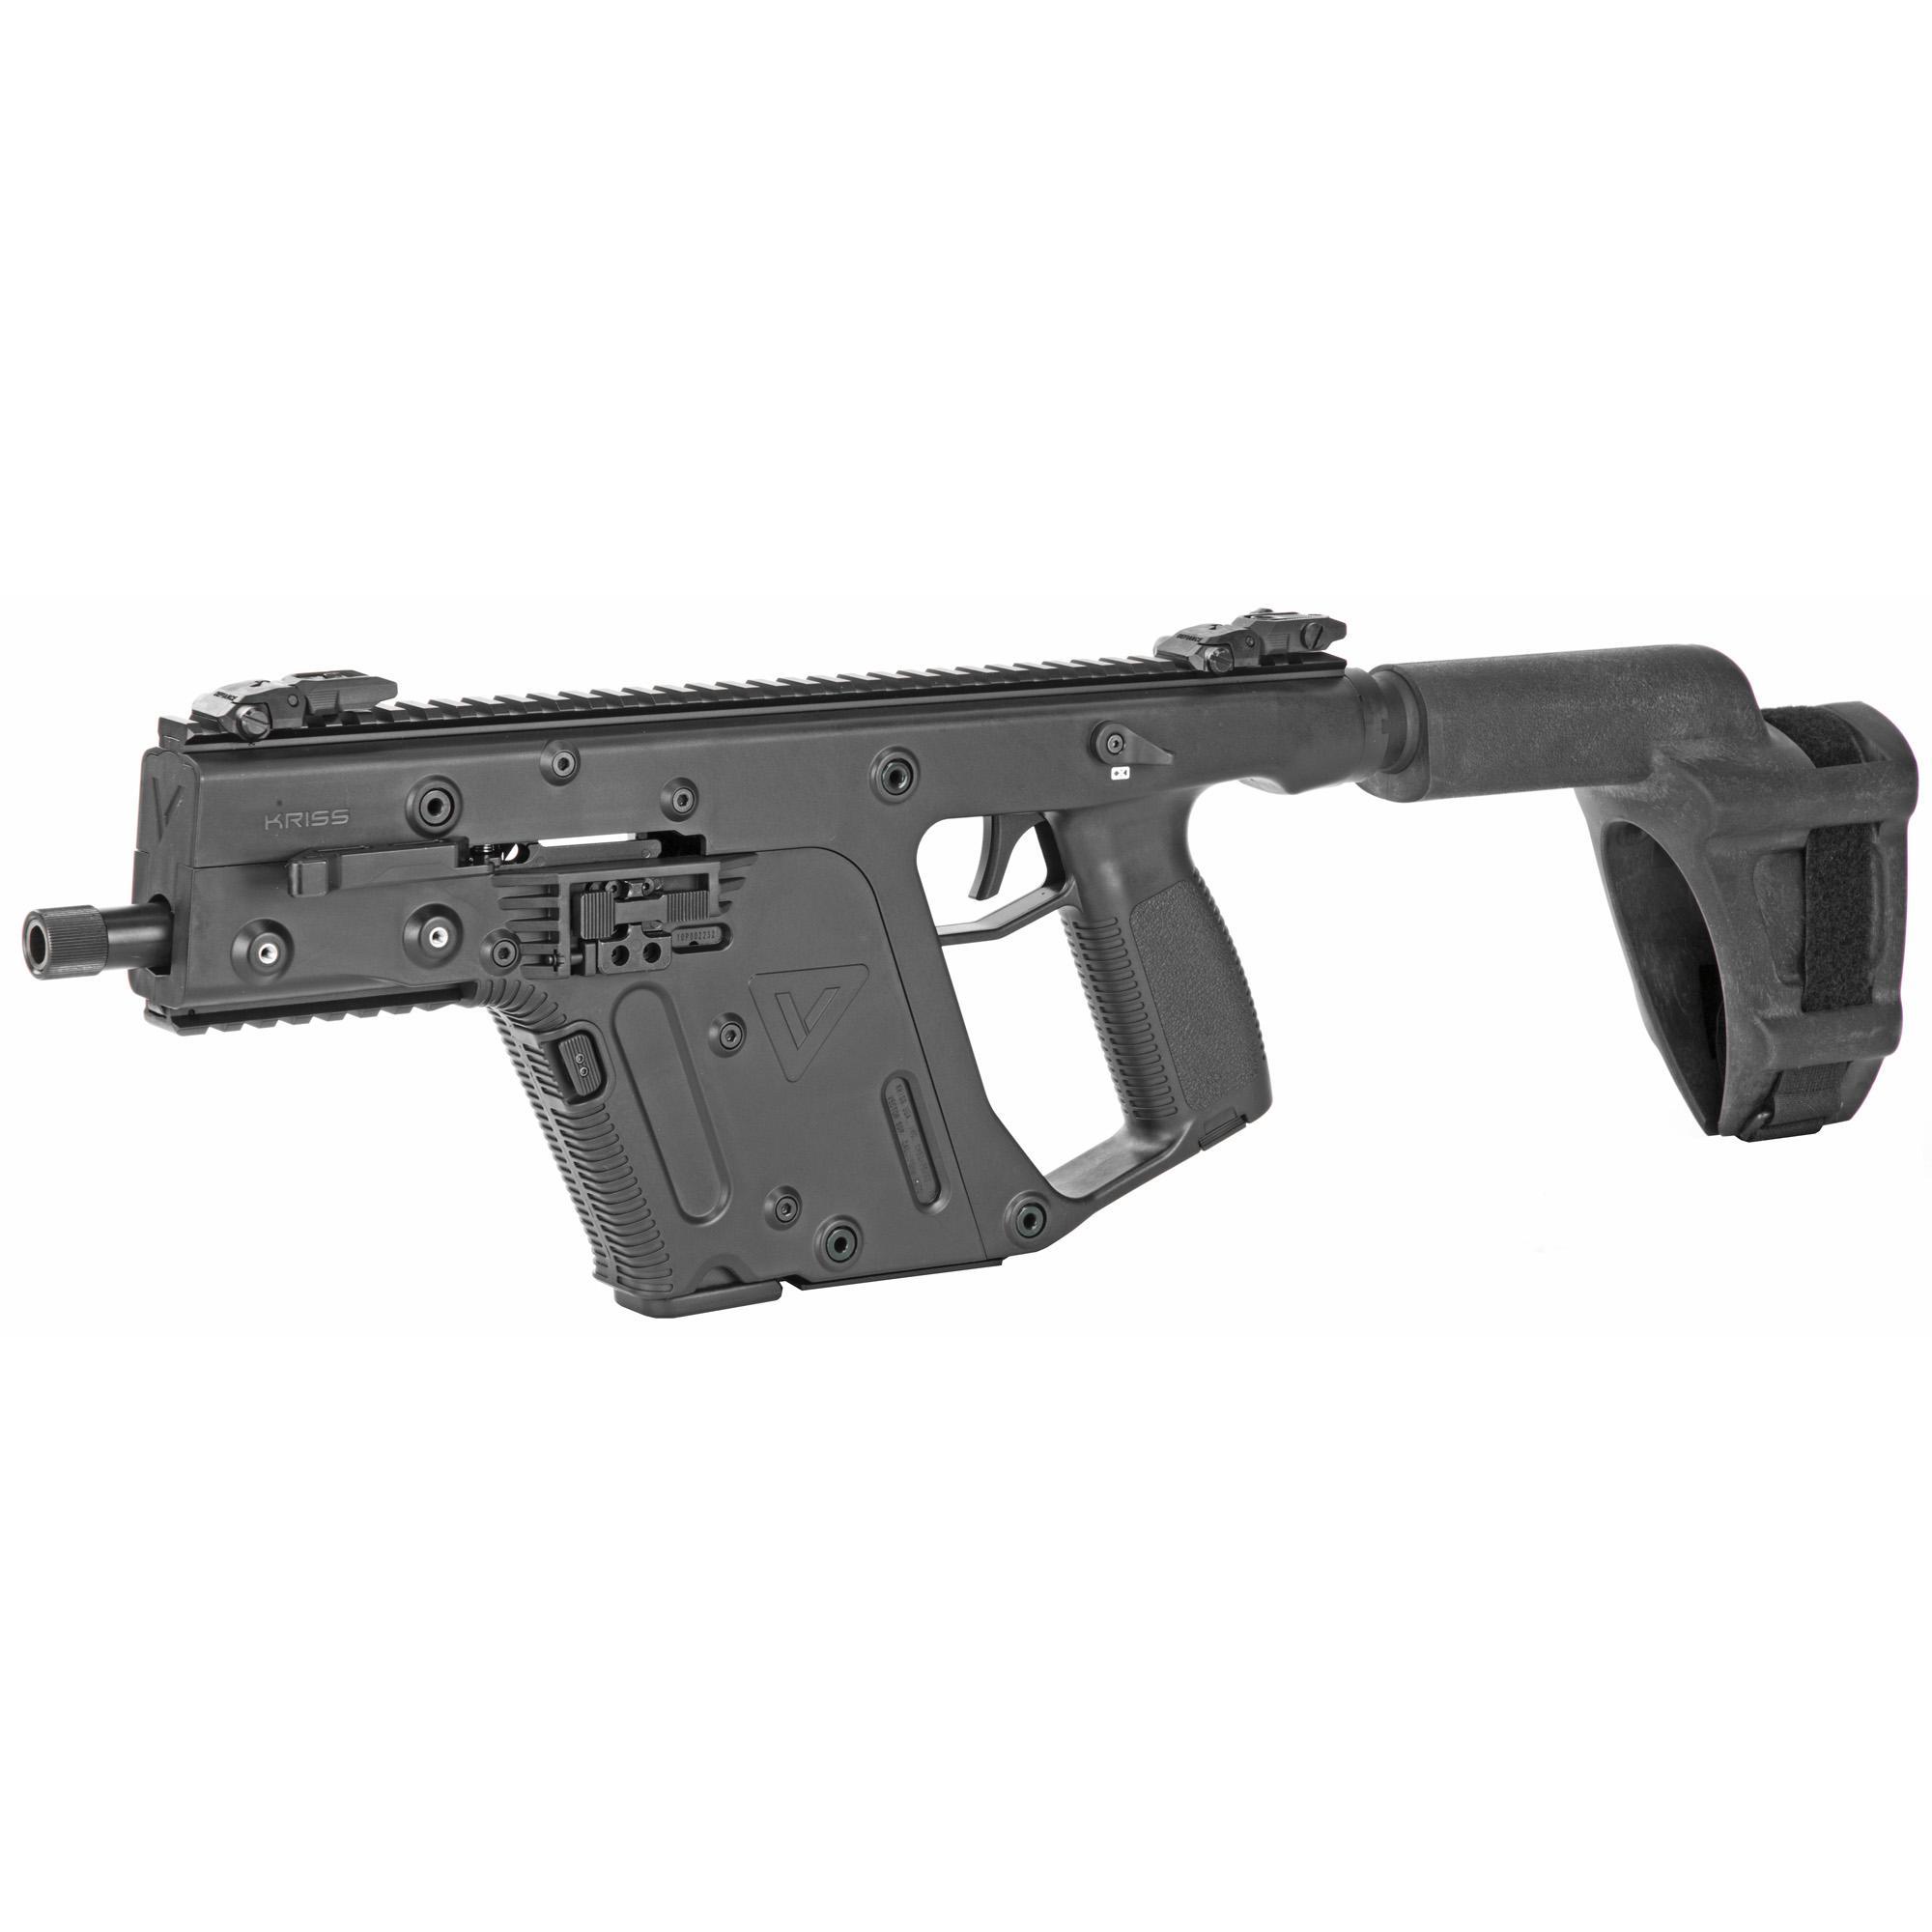 KRISS USA, Inc Kriss Vector Sdp Sb 10mm 5.5